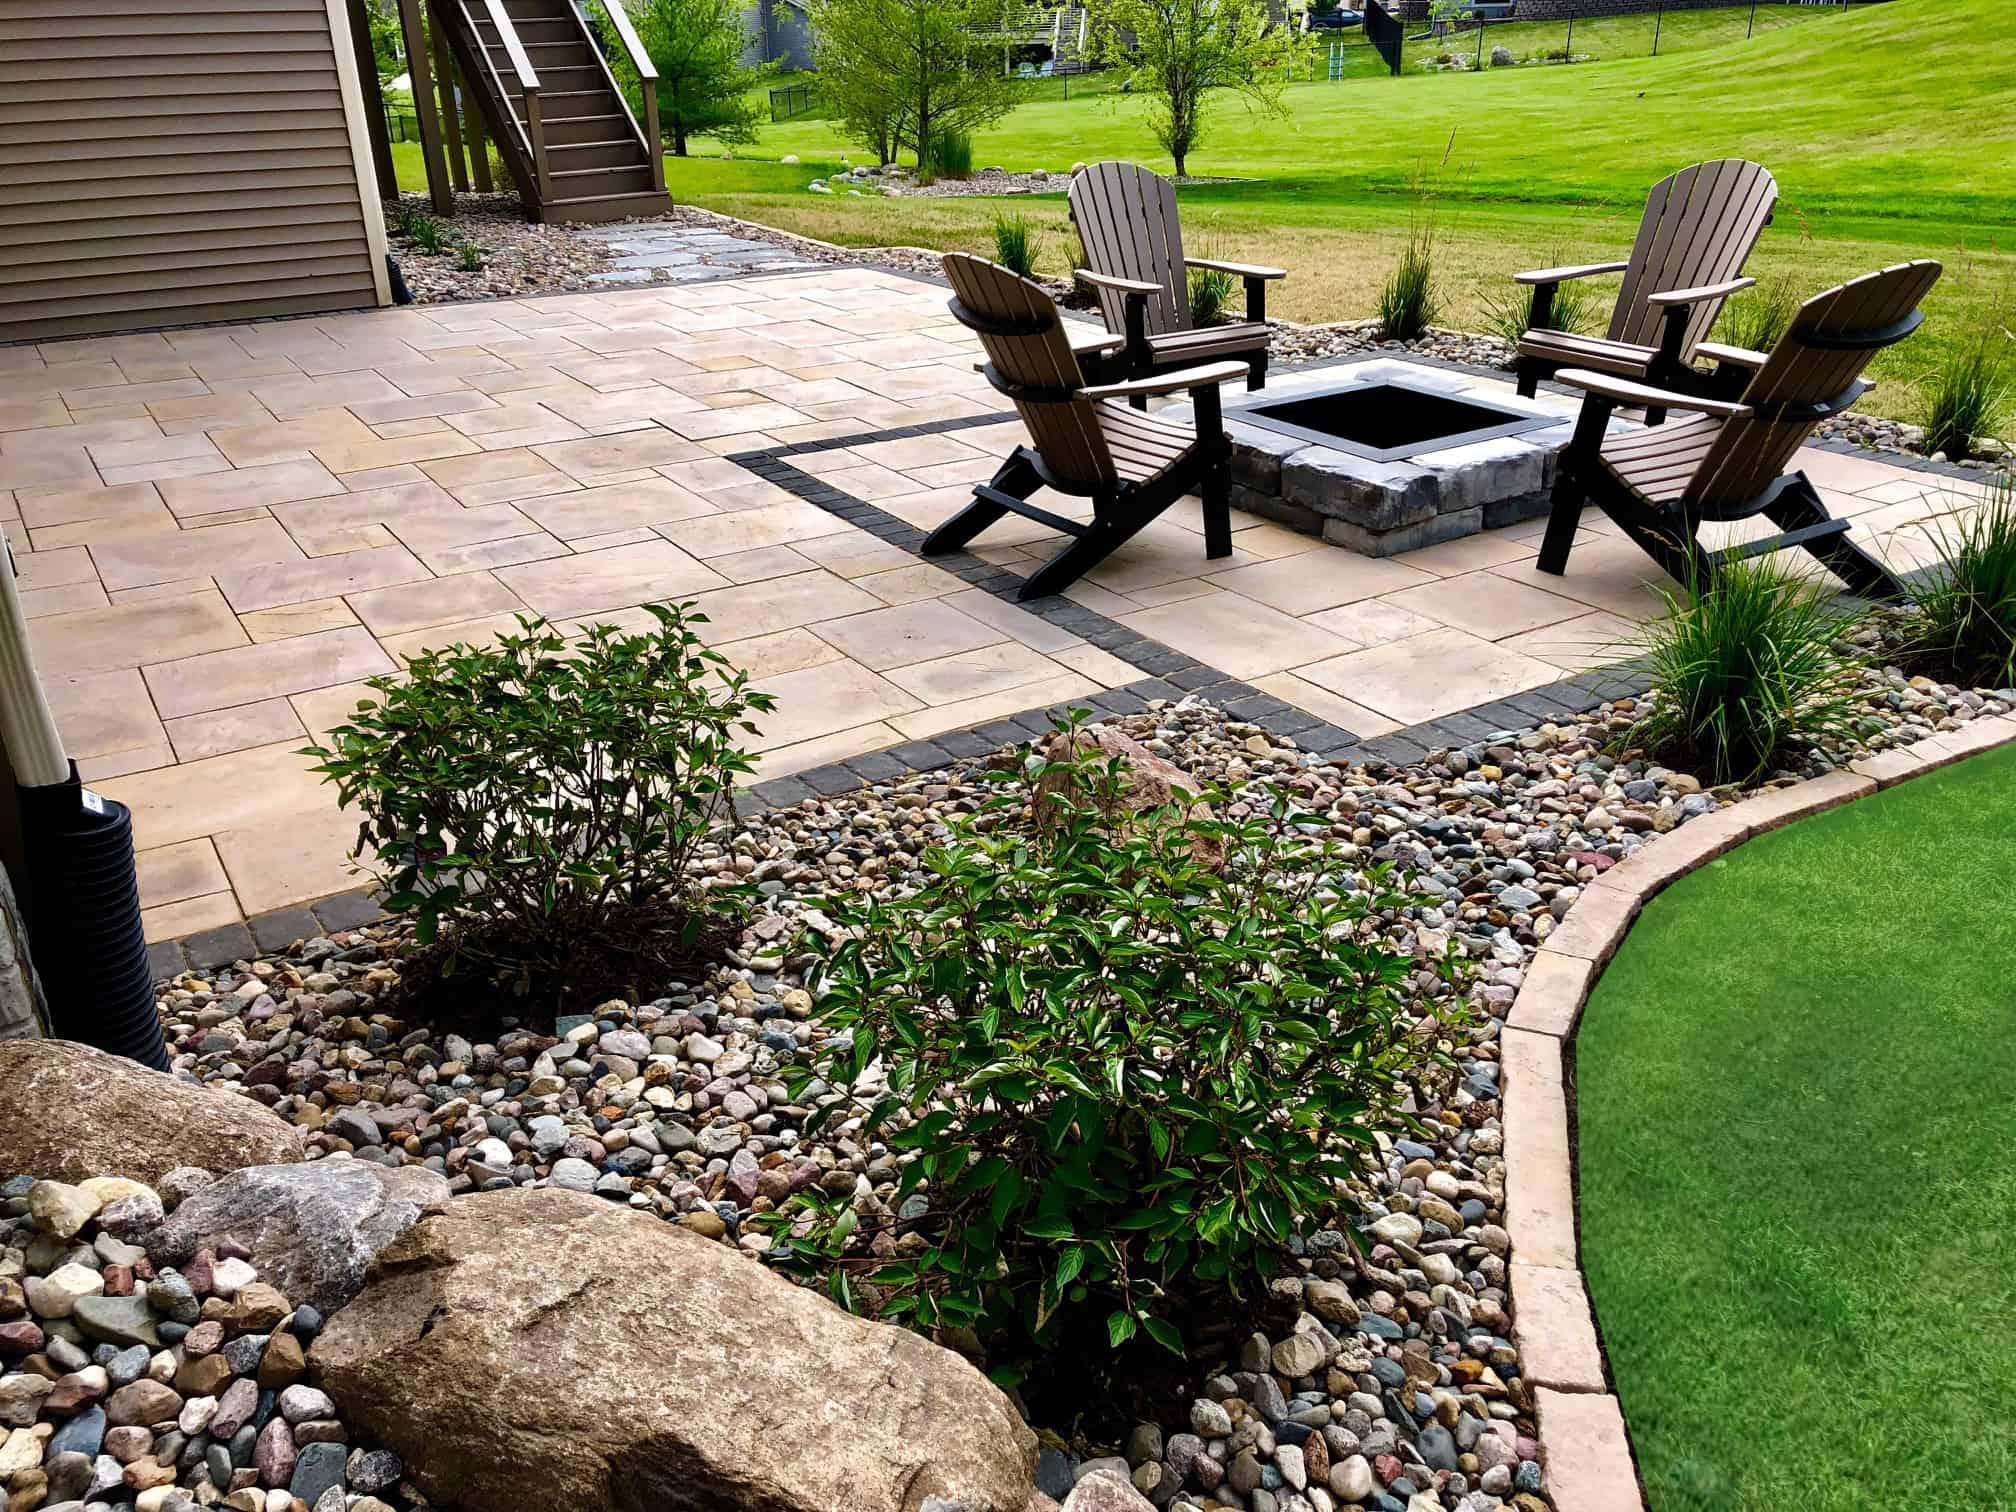 Rosette Dimensional Flagstone patio pavers